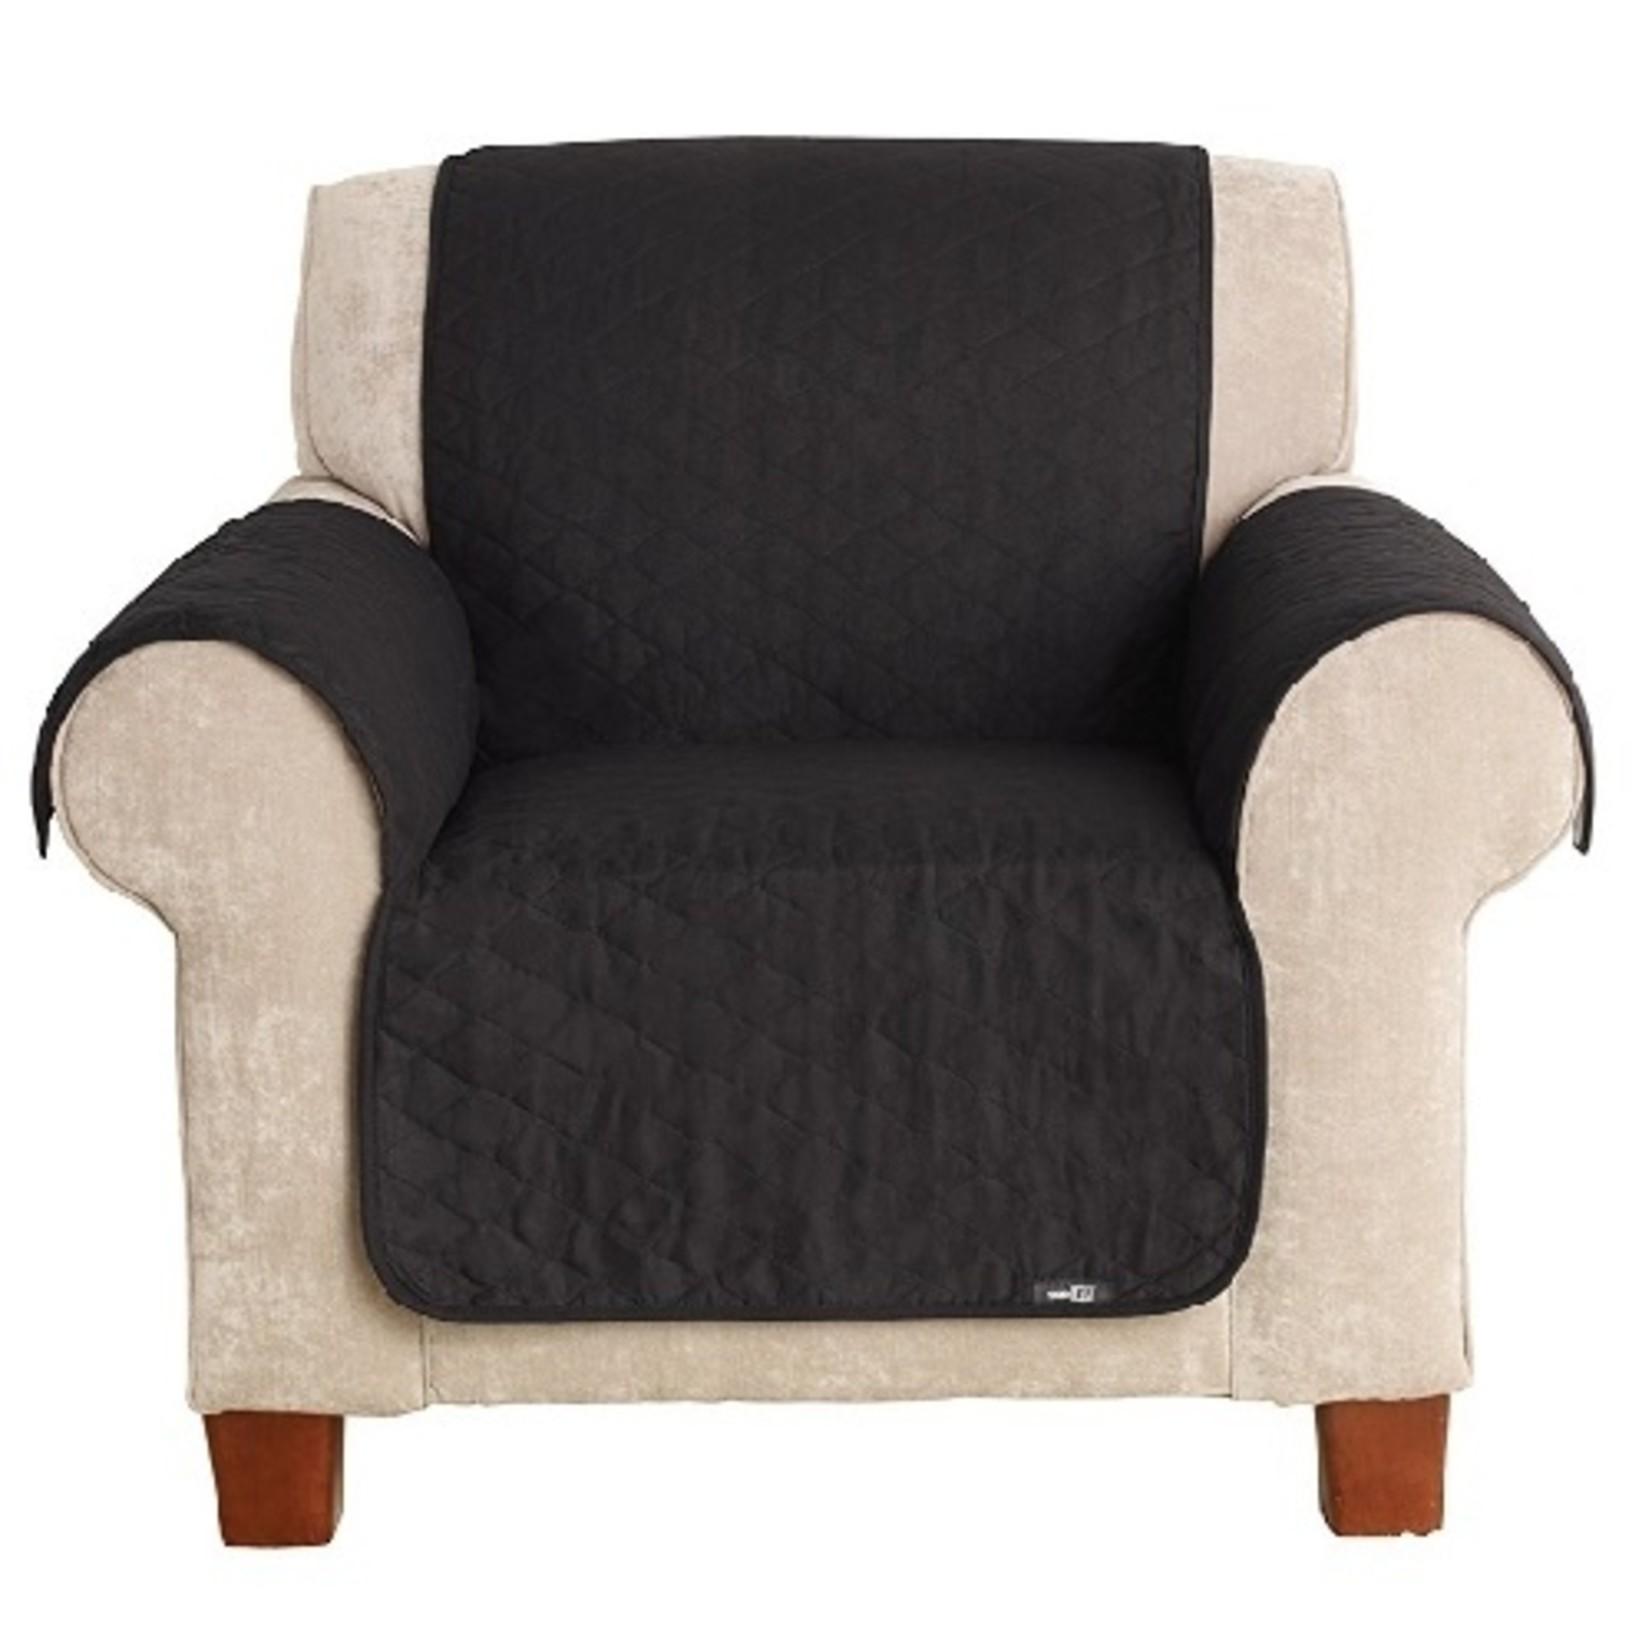 Pet sofa cover black